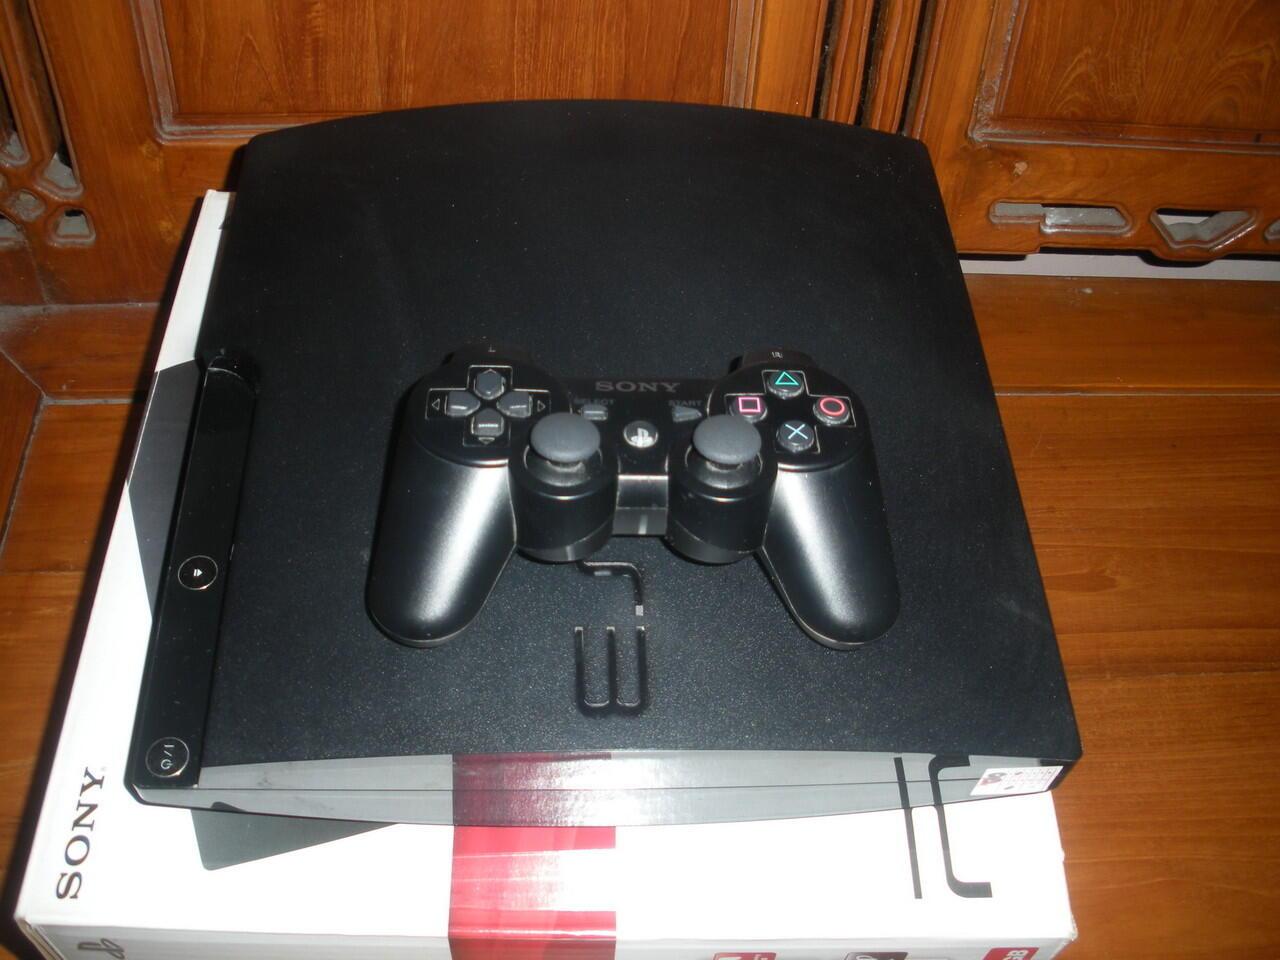 PS3/PLAYSTATION 3 SLIM 120gb CFW ( SOLO )